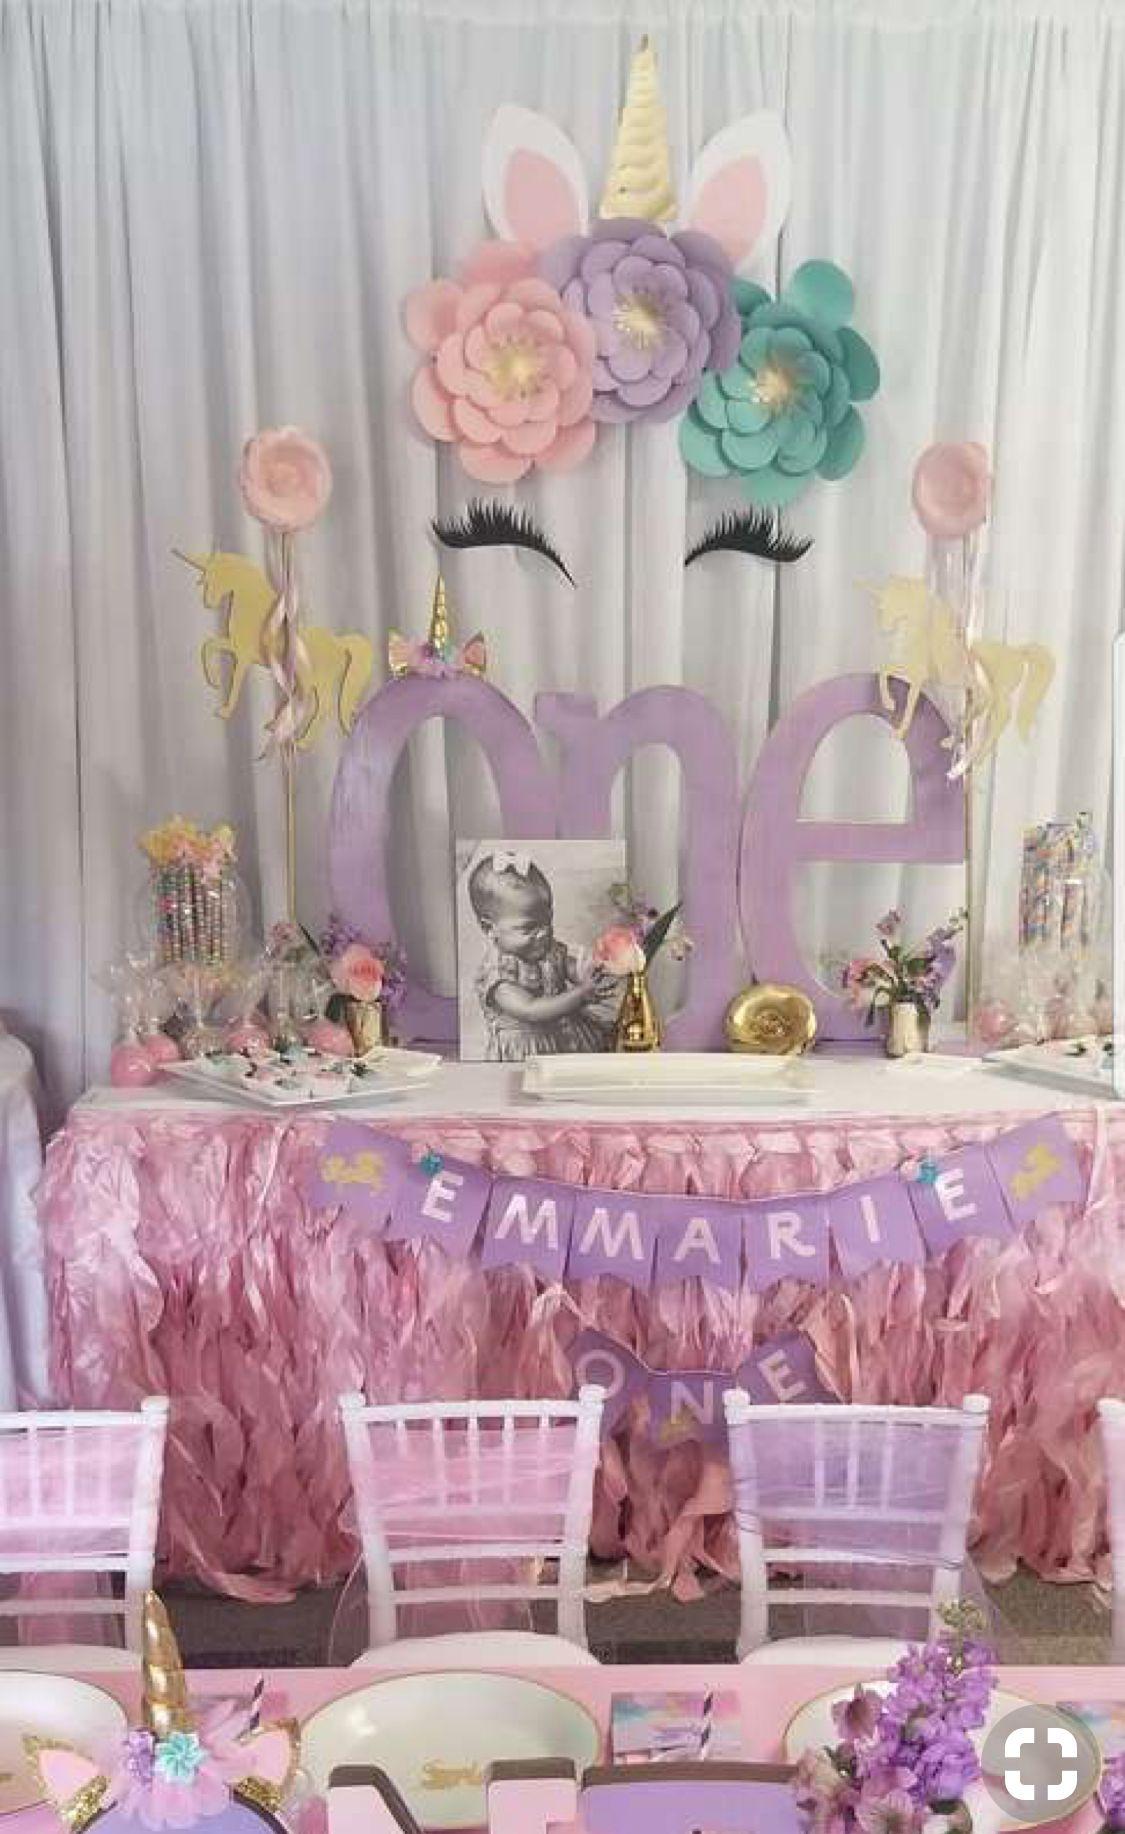 Unicorn Backdrop Easy Diy Unicorn Themed Birthday Party Unicorn Birthday Party Decorations 1st Birthday Party For Girls